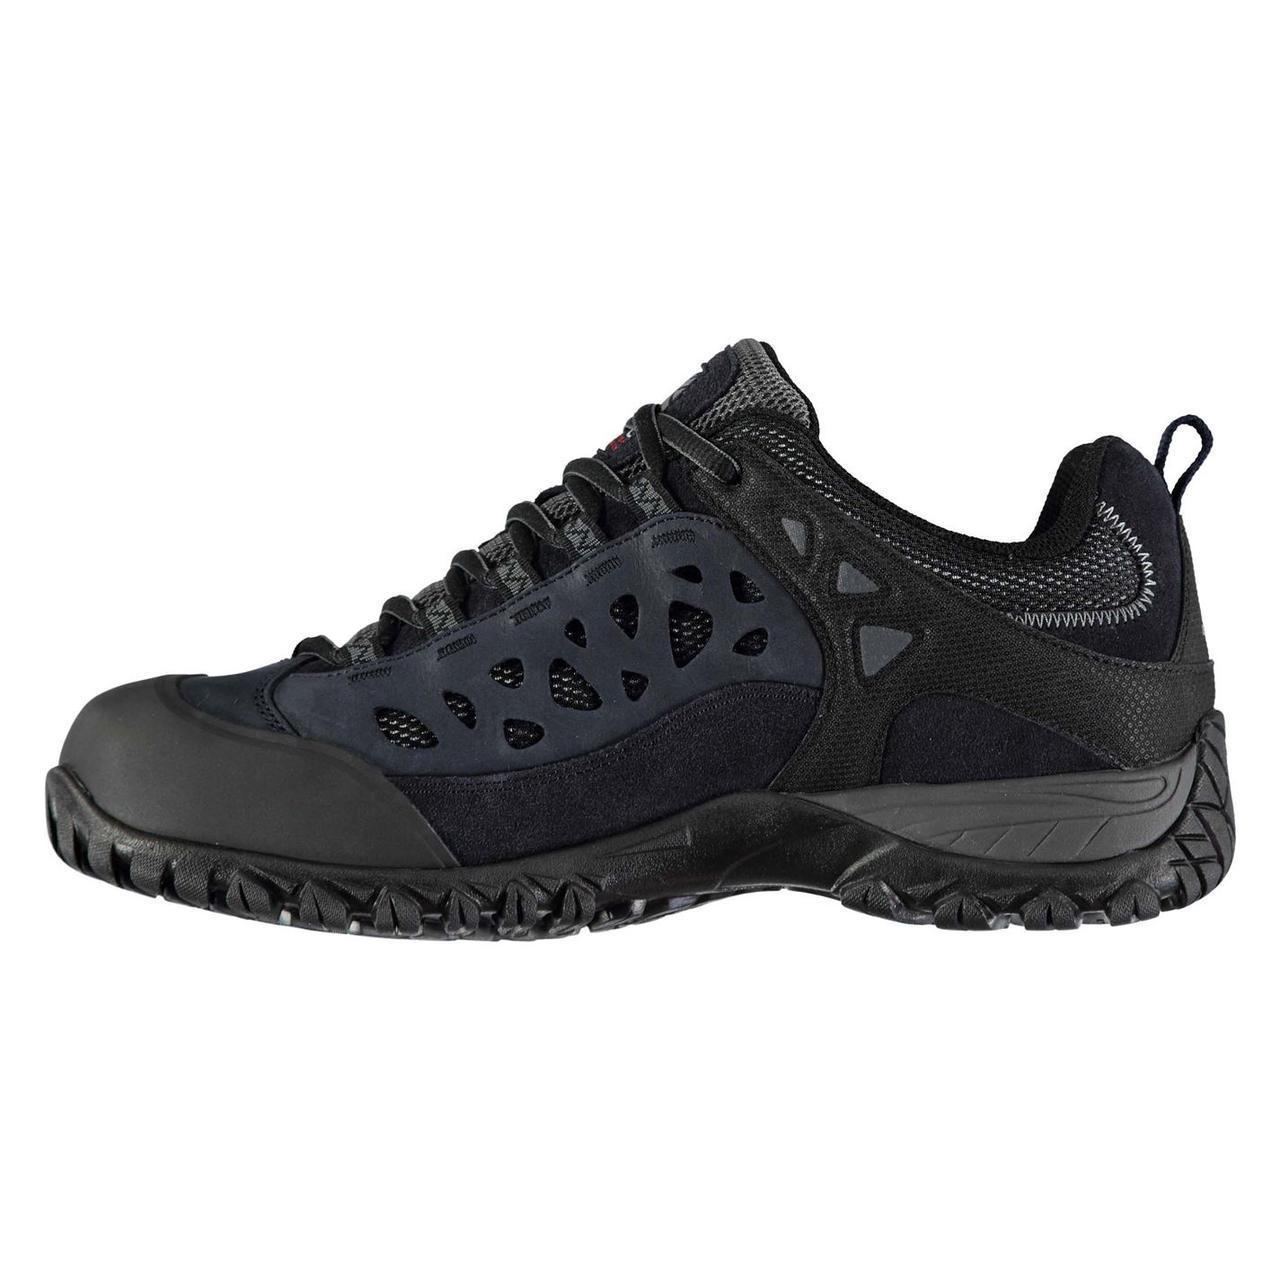 Треккинговые ботинки Karrimor Corrie WTX (44,45) Англия